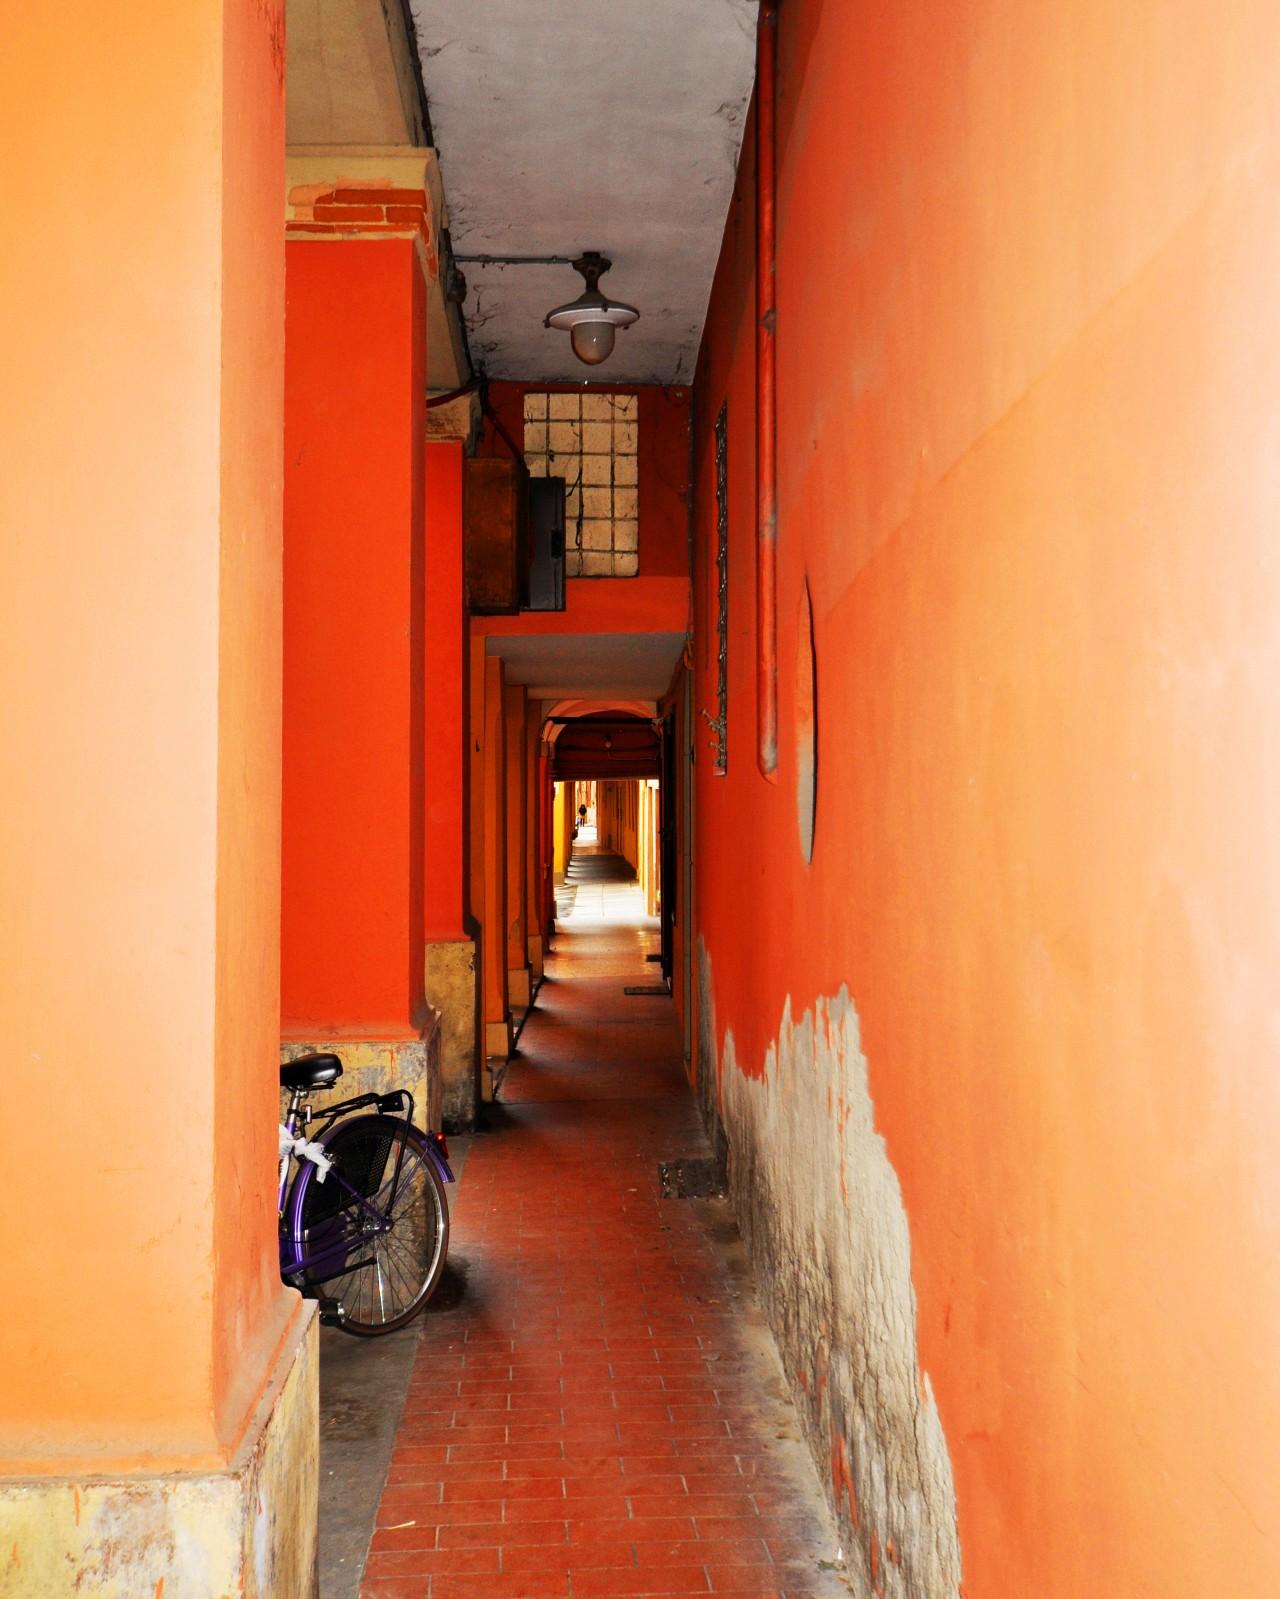 Via Senzanome